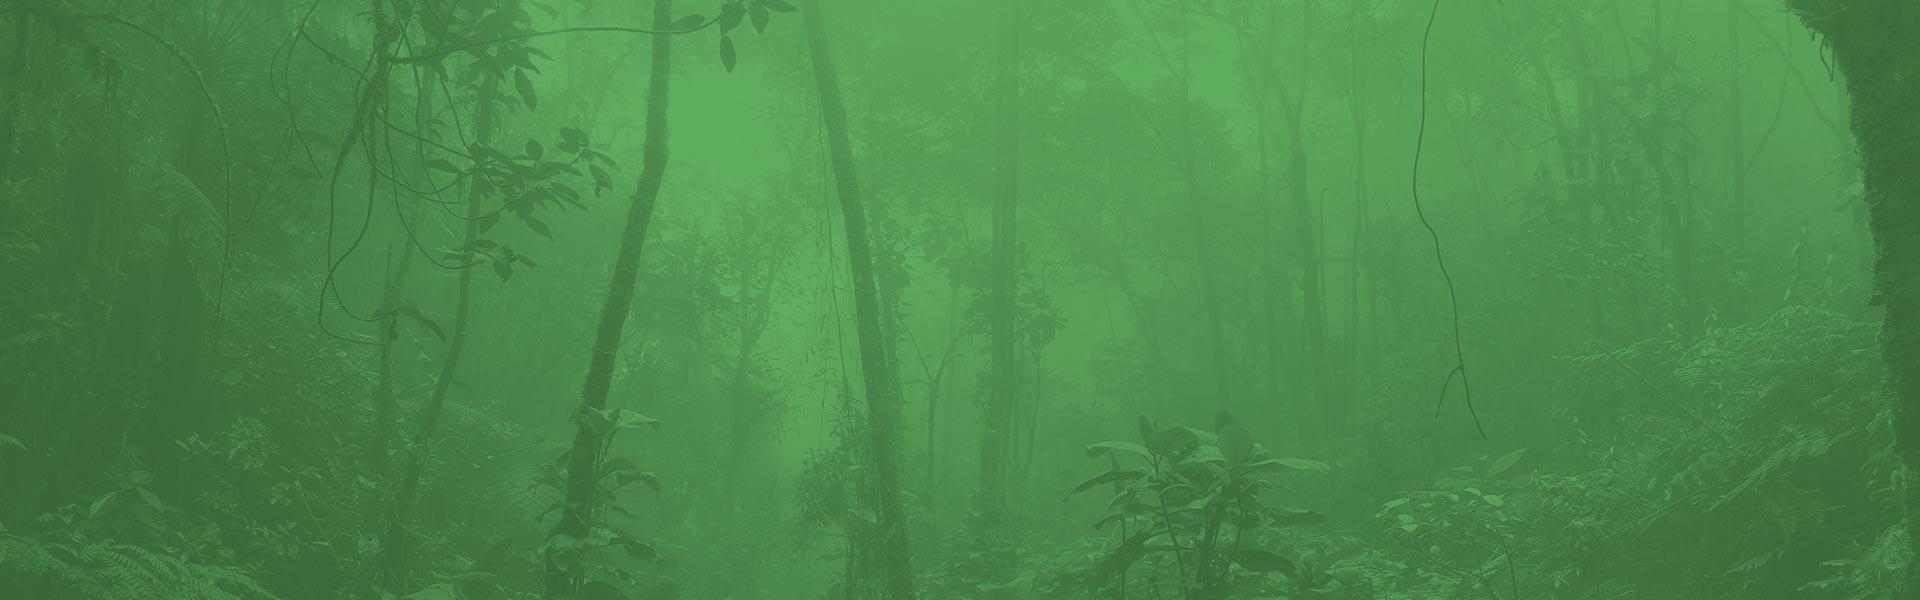 trees-bg-overlay